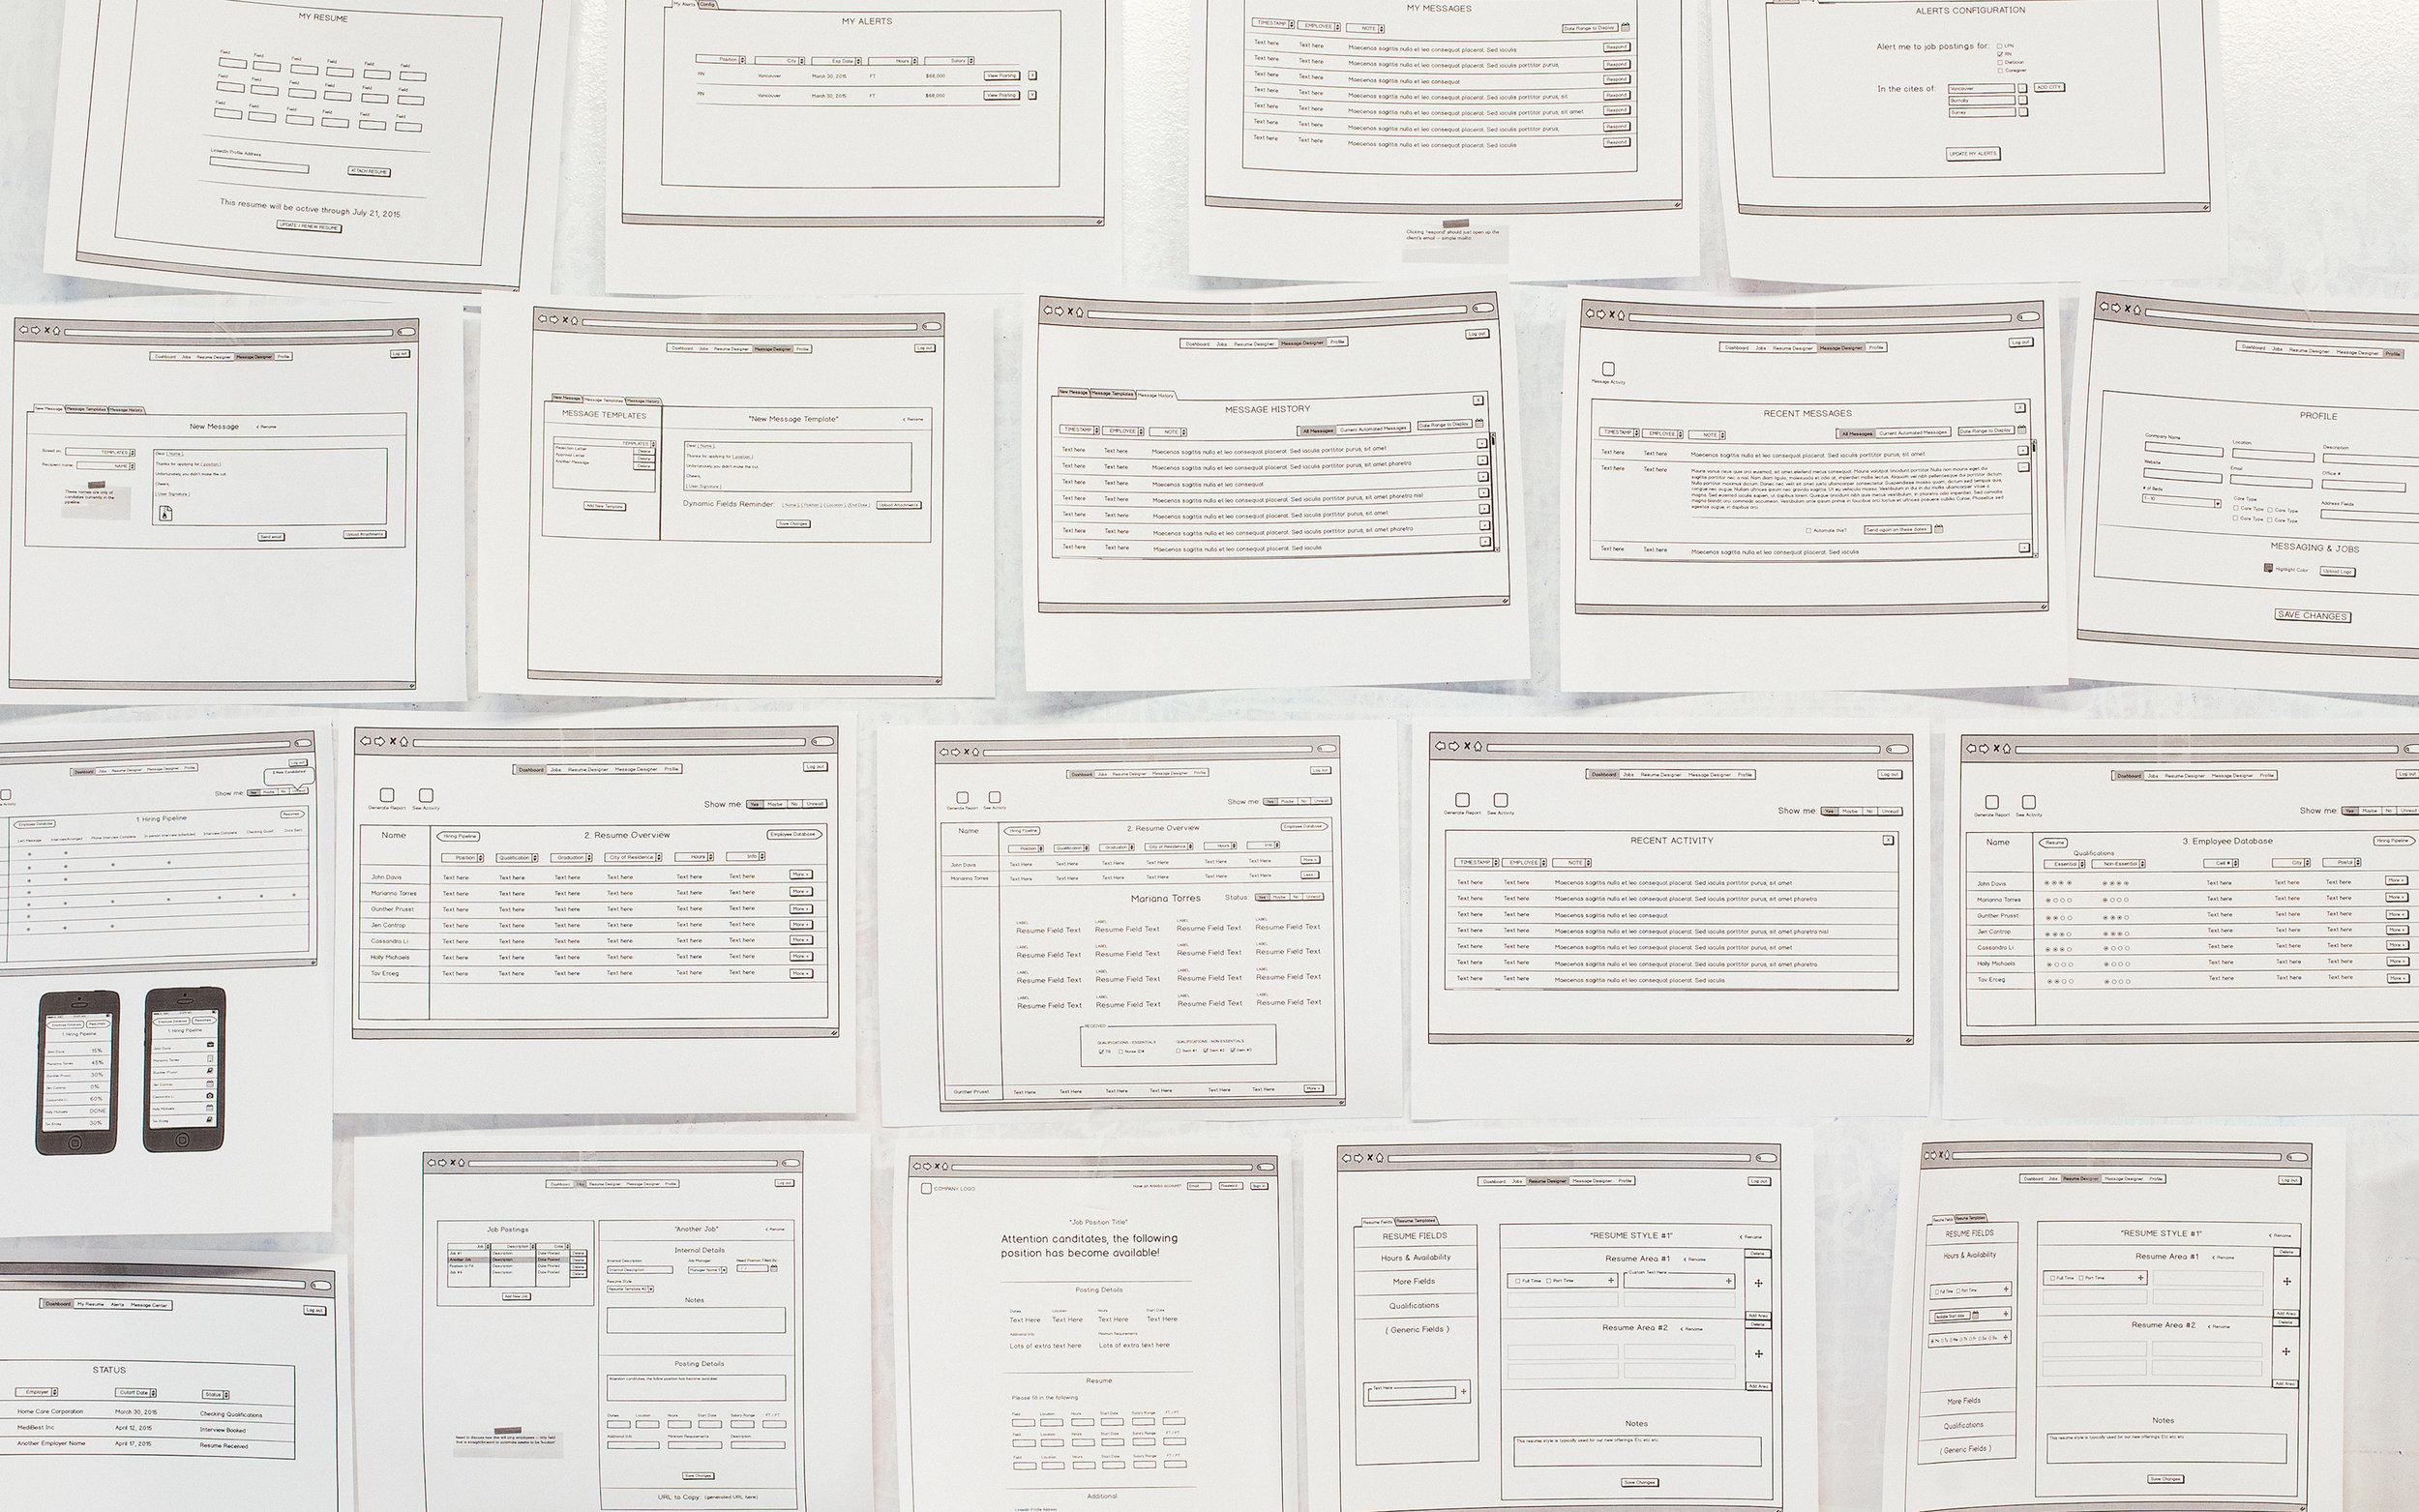 HM_Doc_ARO_Papers2.jpg